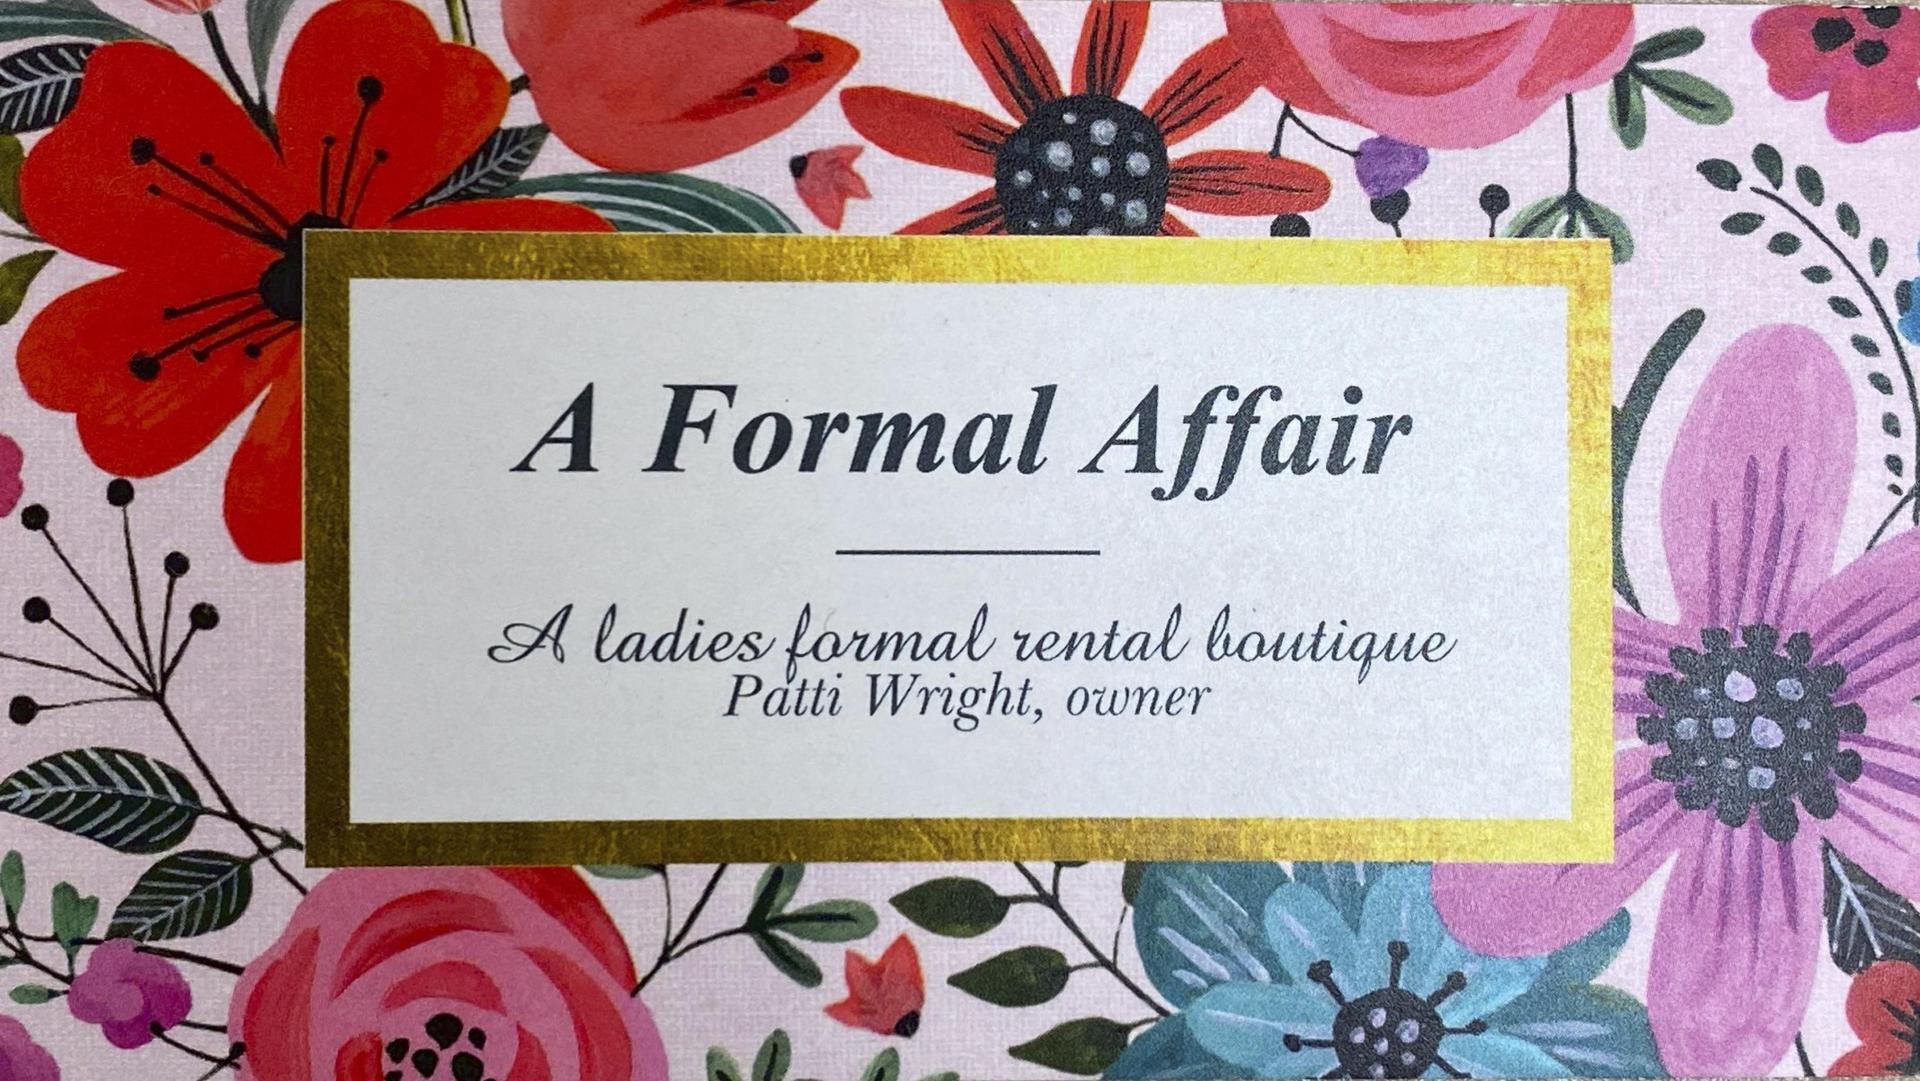 An advertisement for A Formal Affair